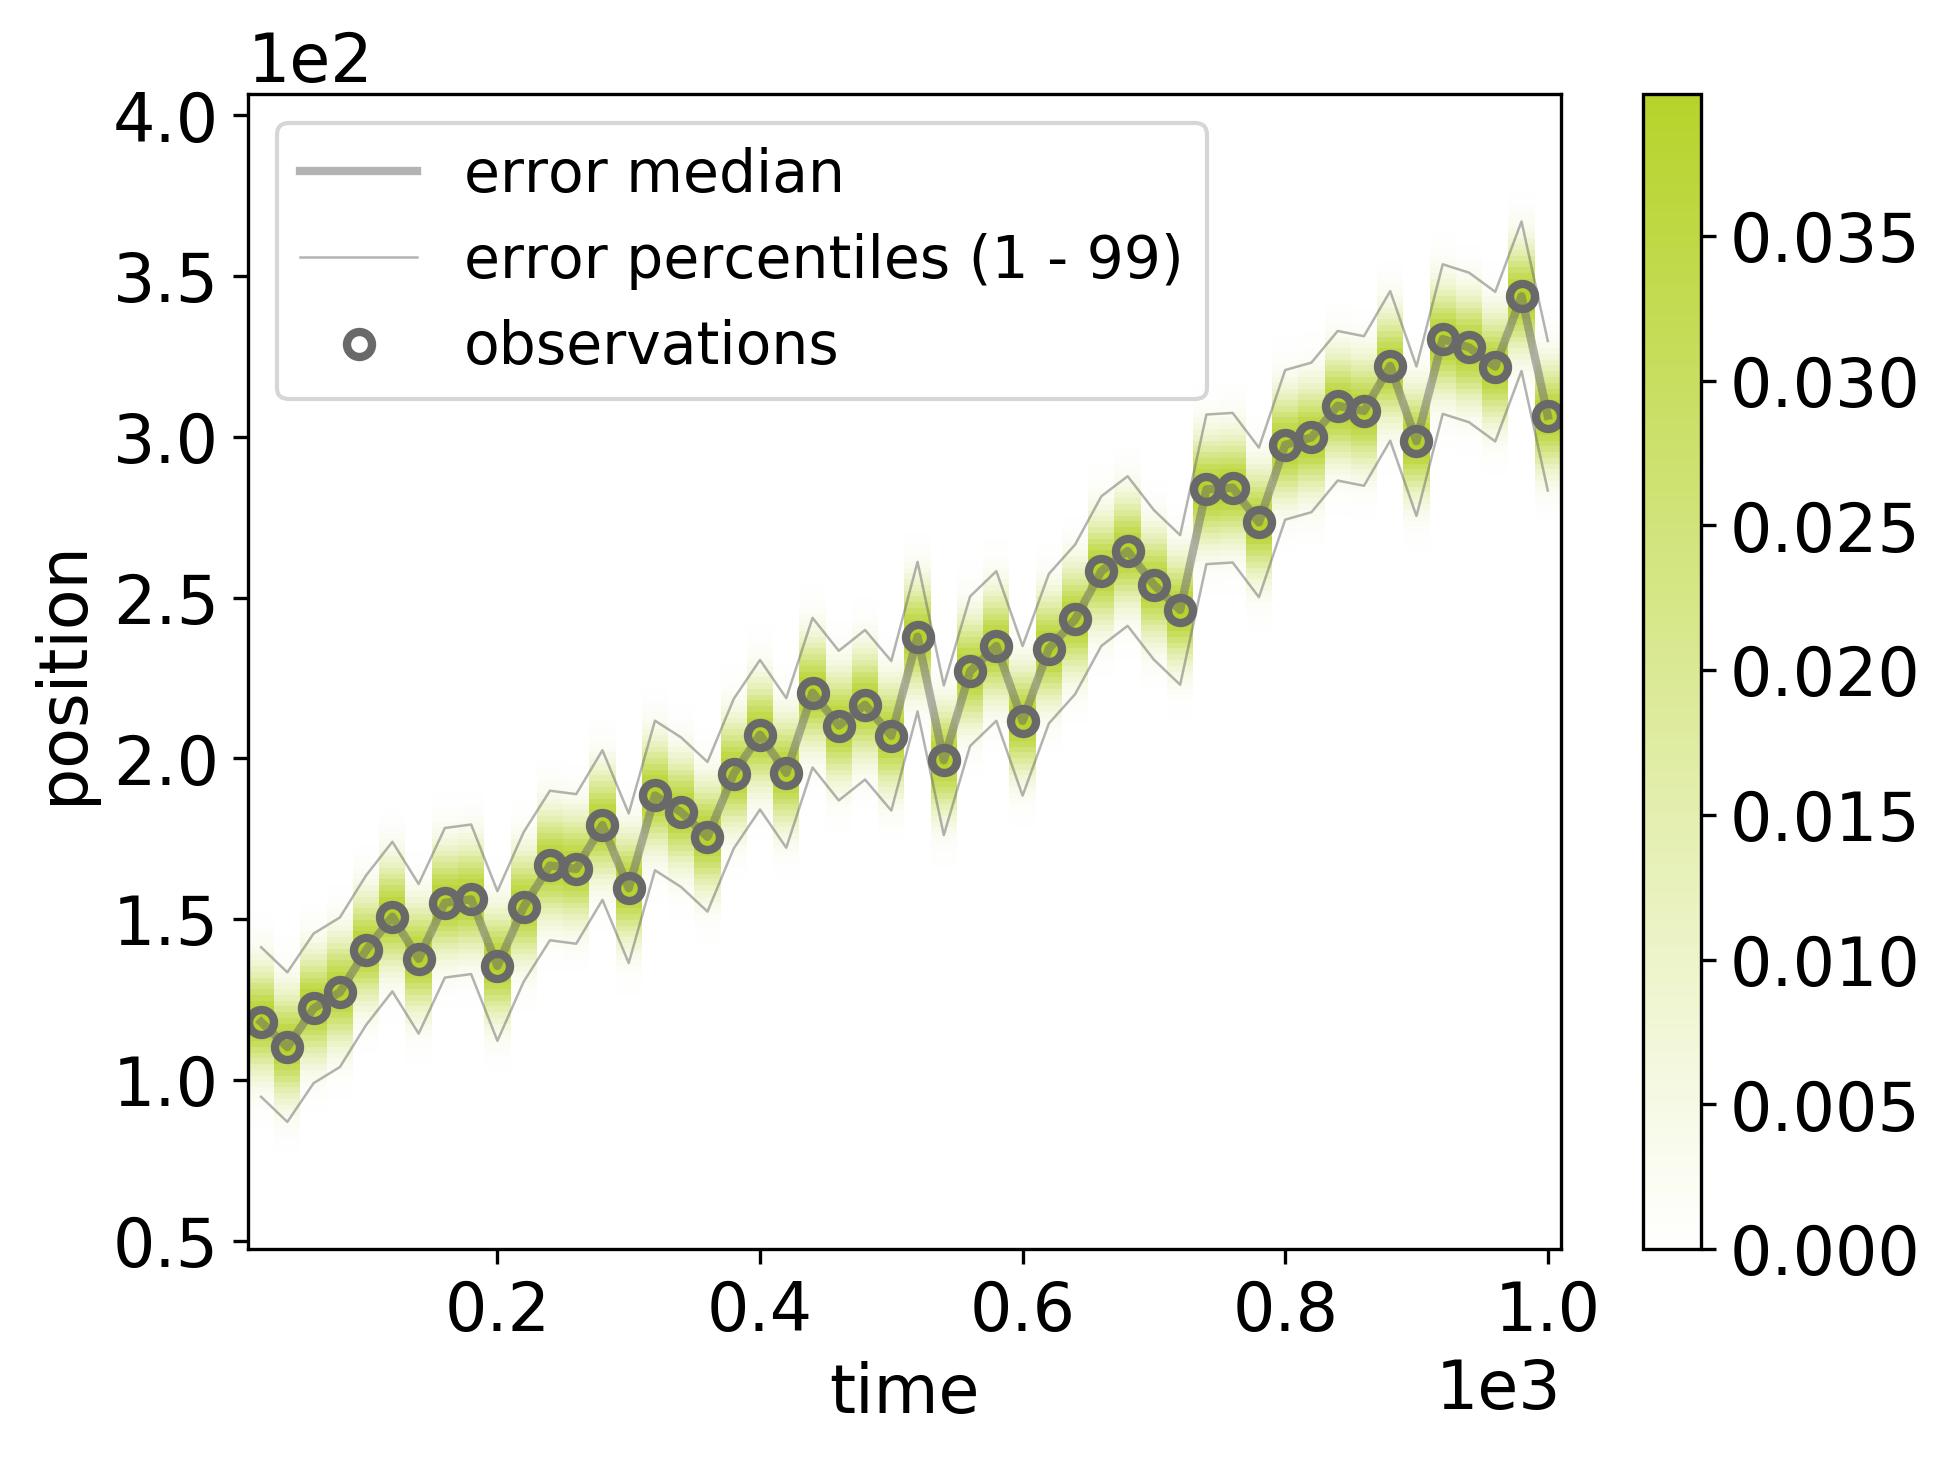 docs/_static/randomwalk/randomwalk_errors-dataset-1.png